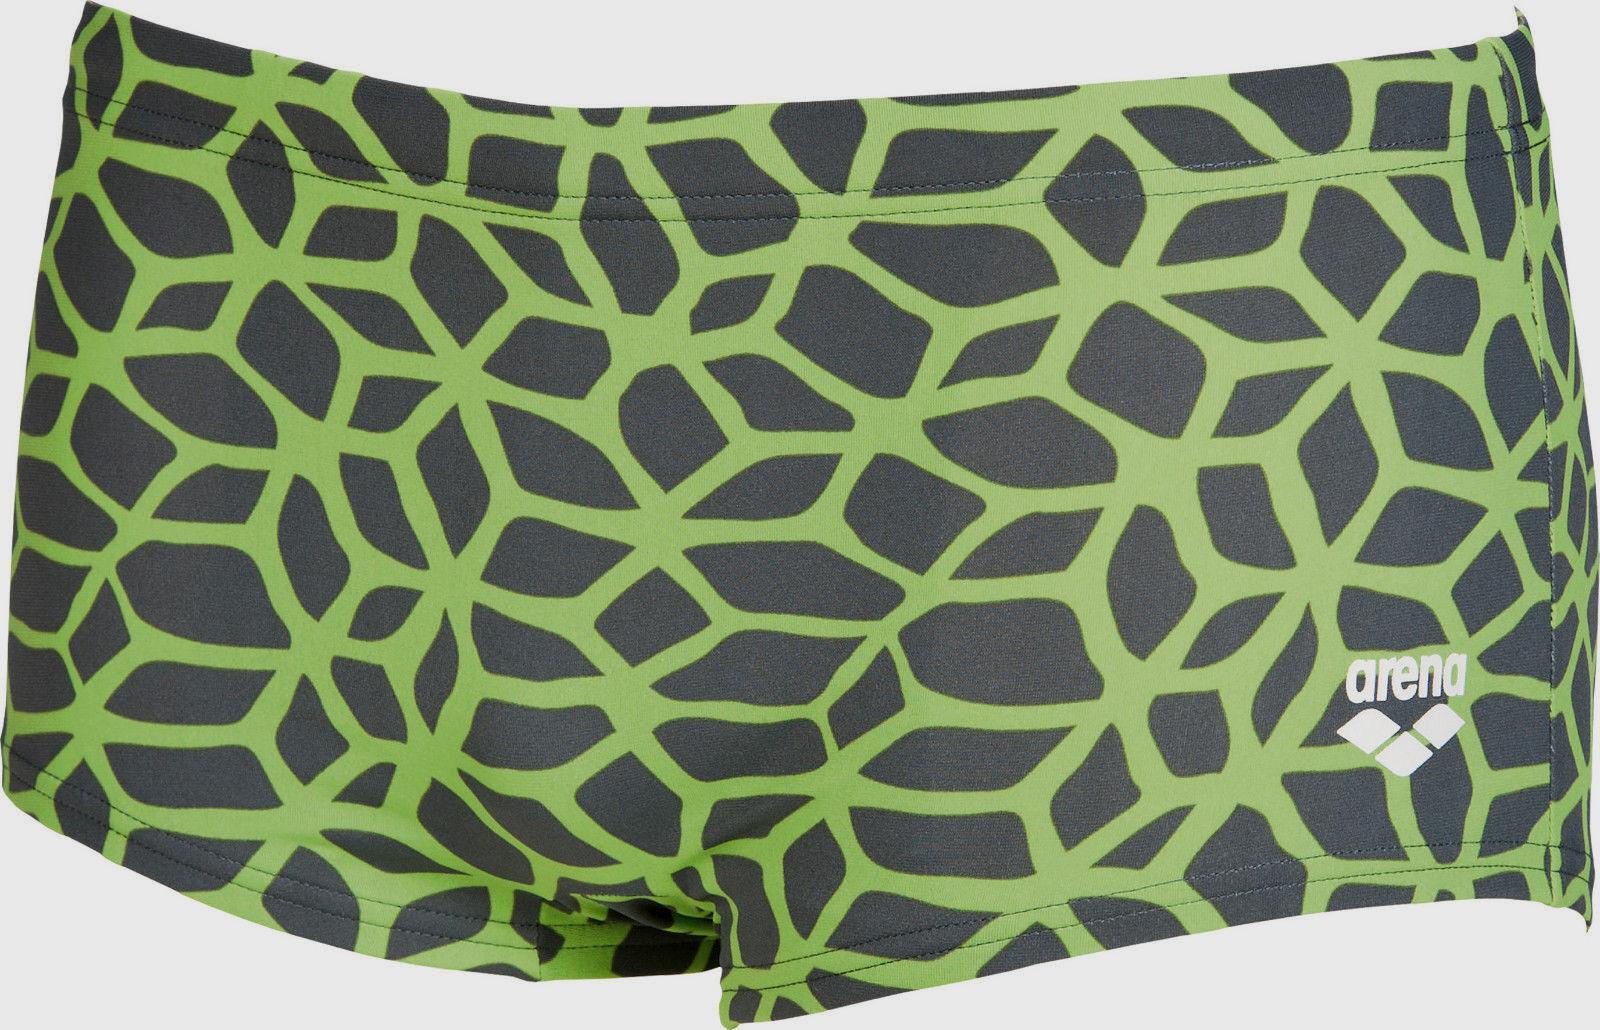 Mens KooGa Cut-and-sew Printed Panels Hardwearing /& Comfortable Shirt Top S-3XL